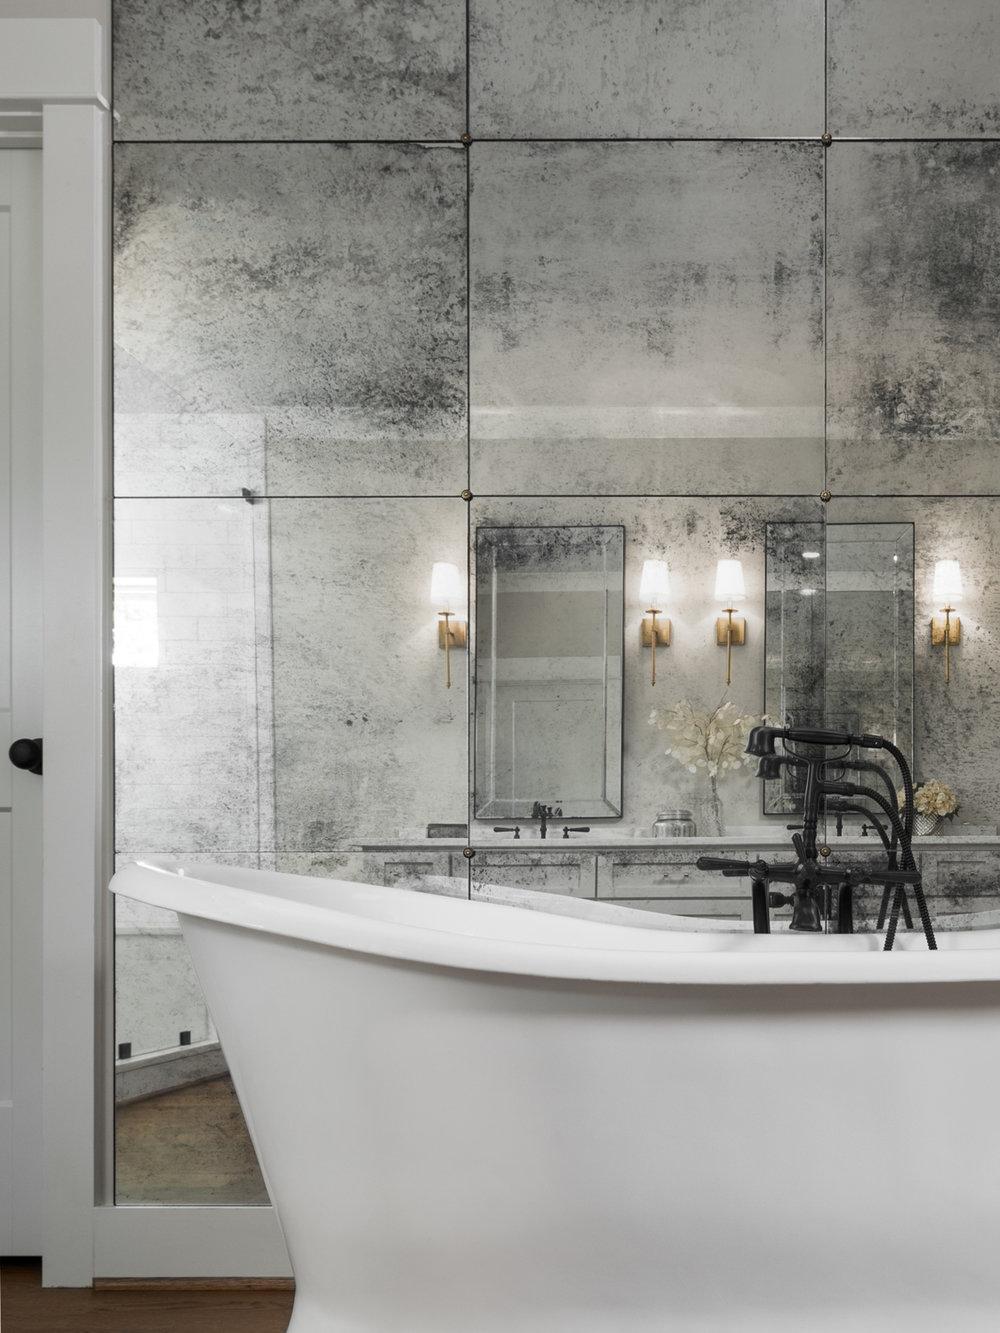 532 Broadway Bathroom-0001-2.jpg